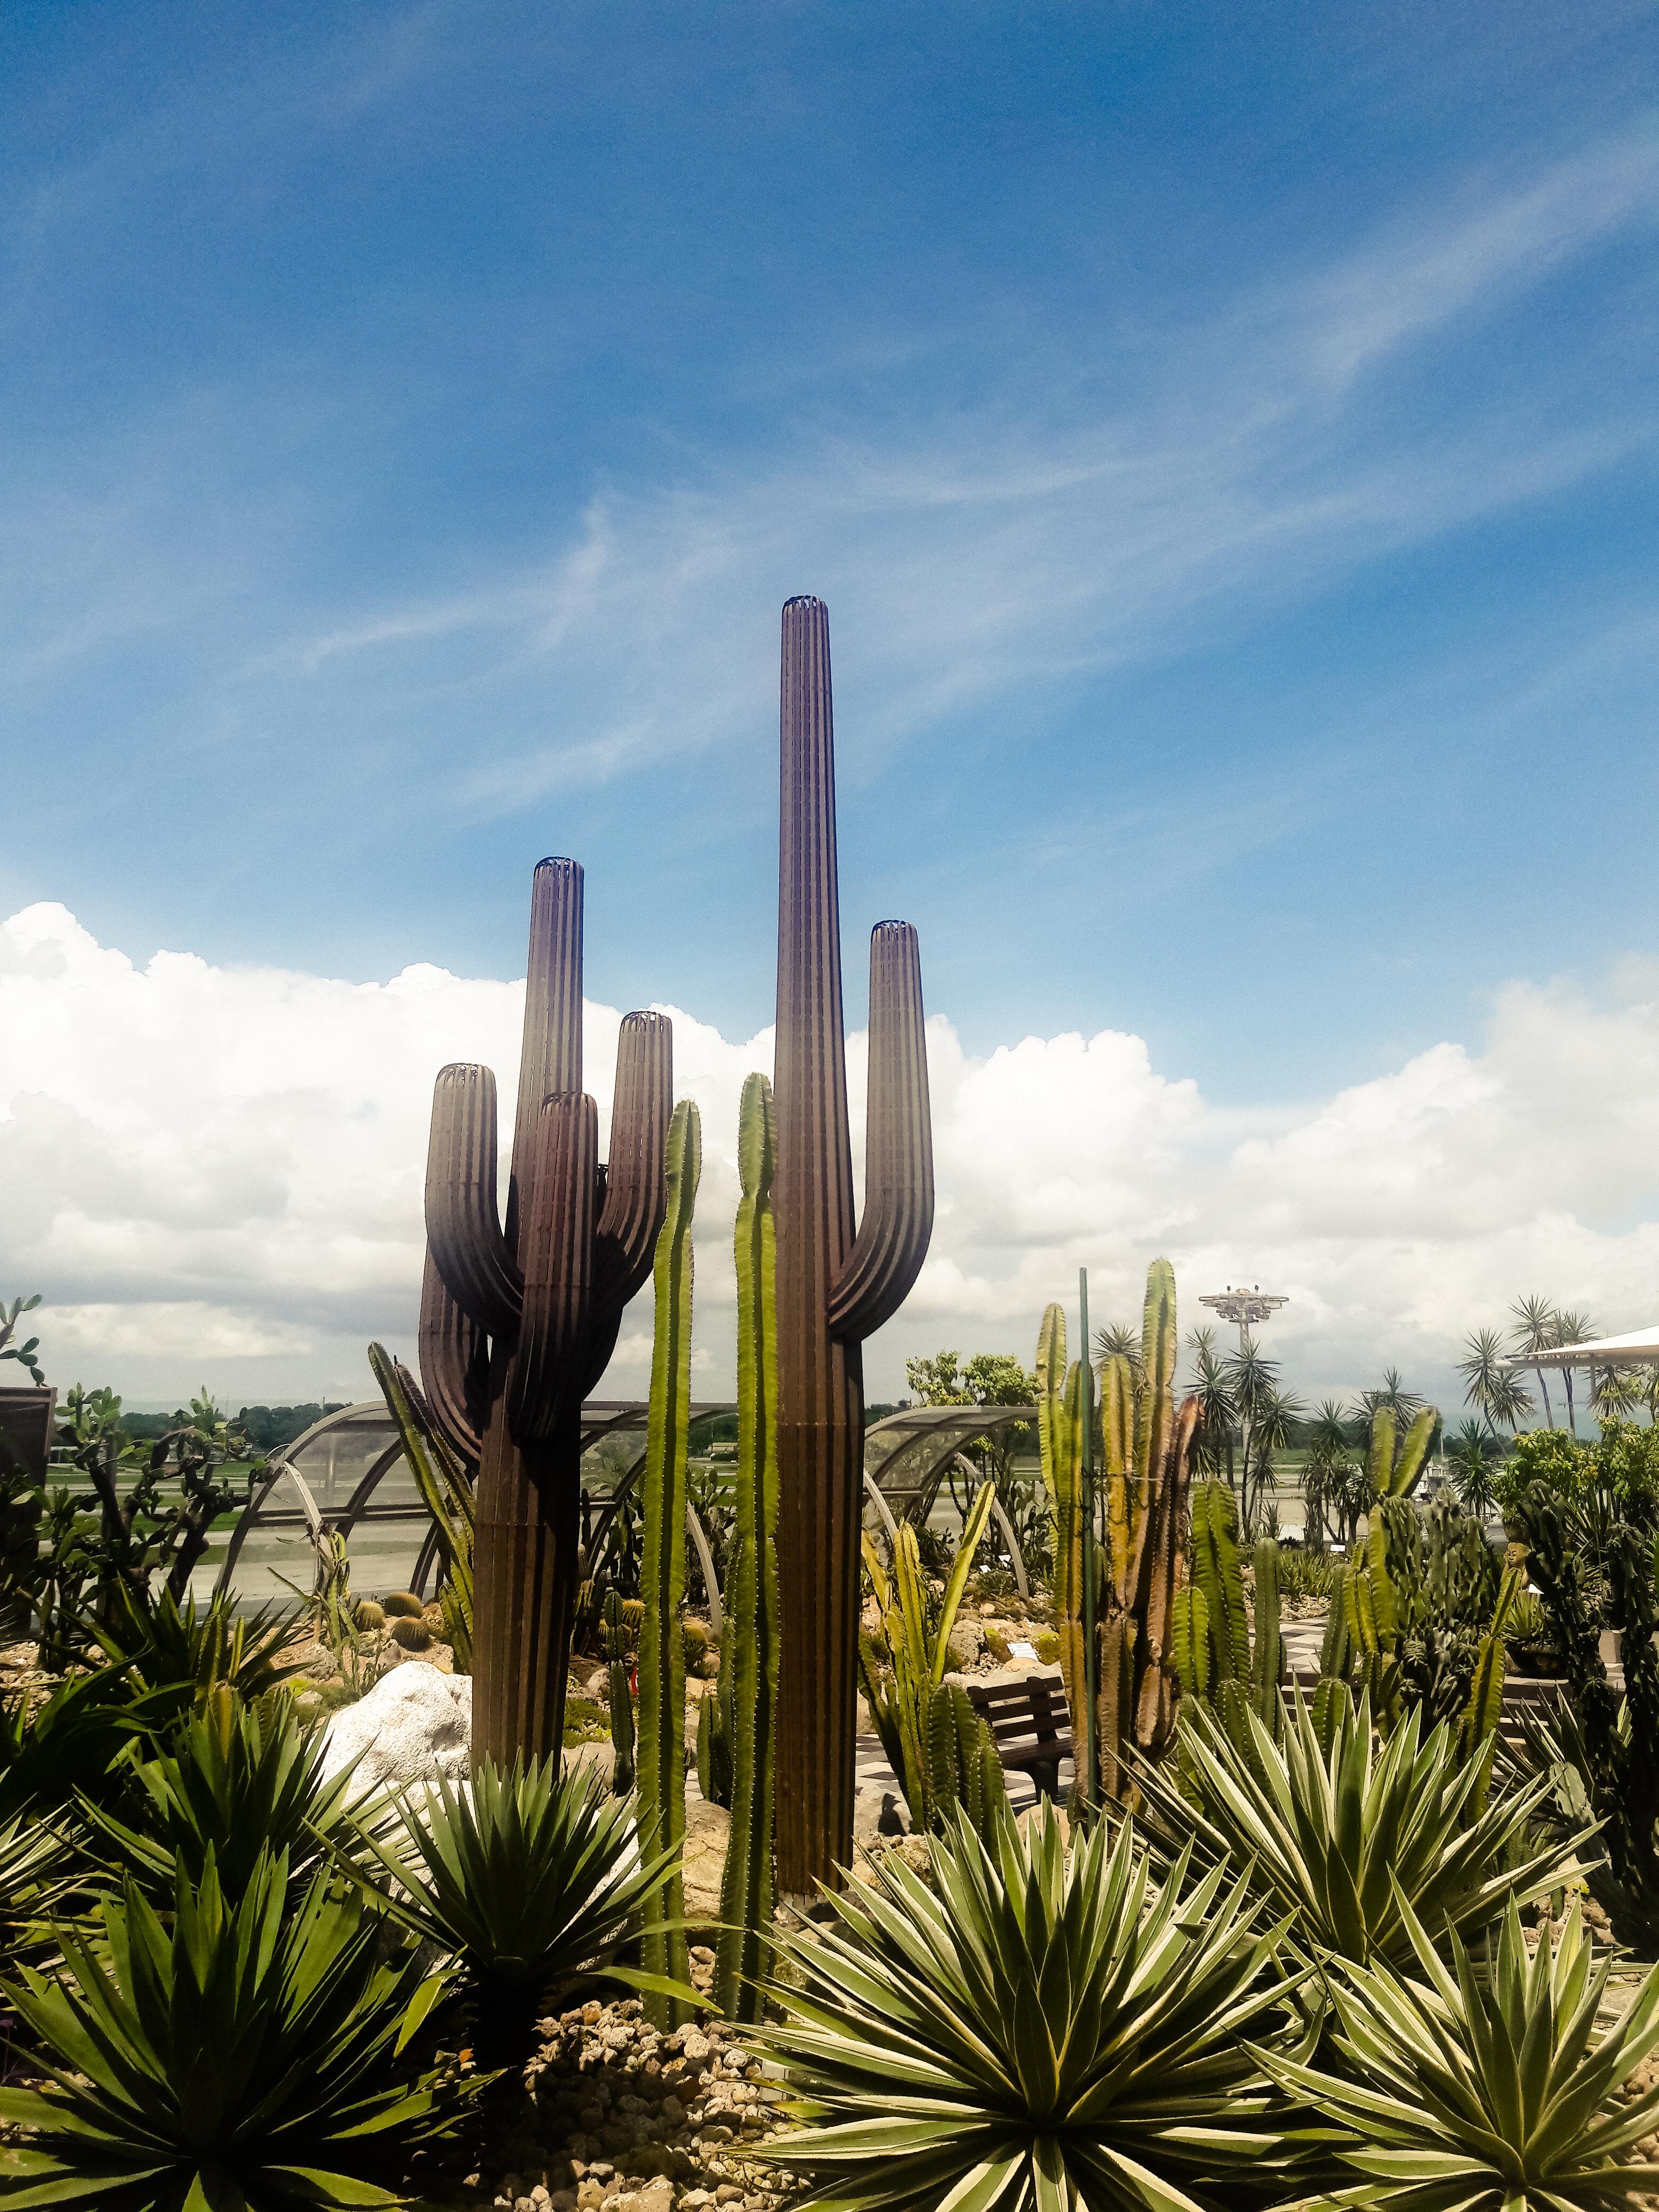 Cactus Garden, Changi Airport, Singapore